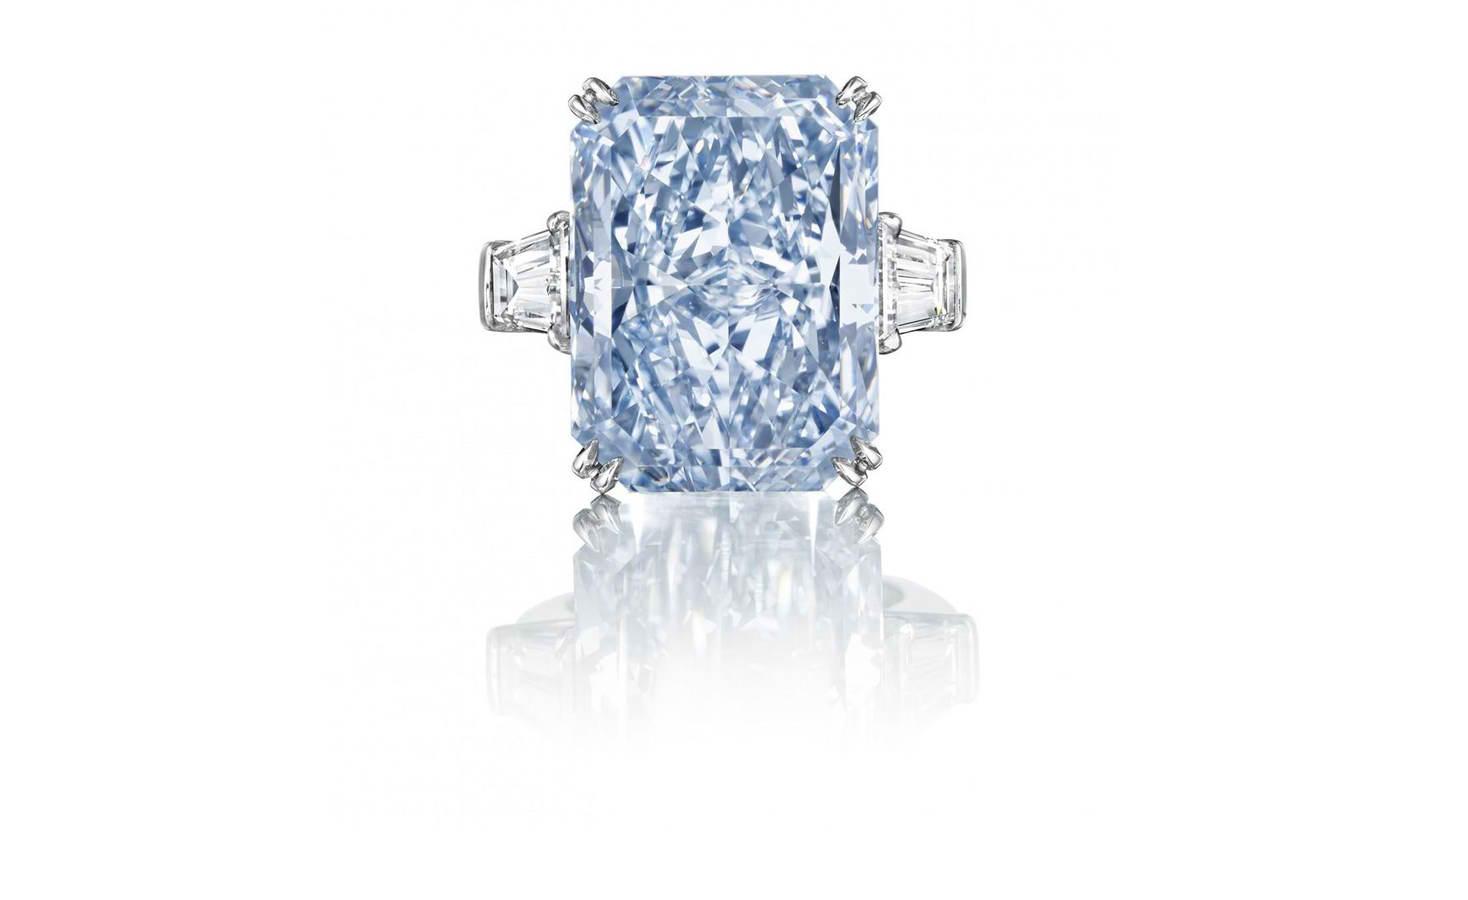 THE CULLINAN DIAMOND